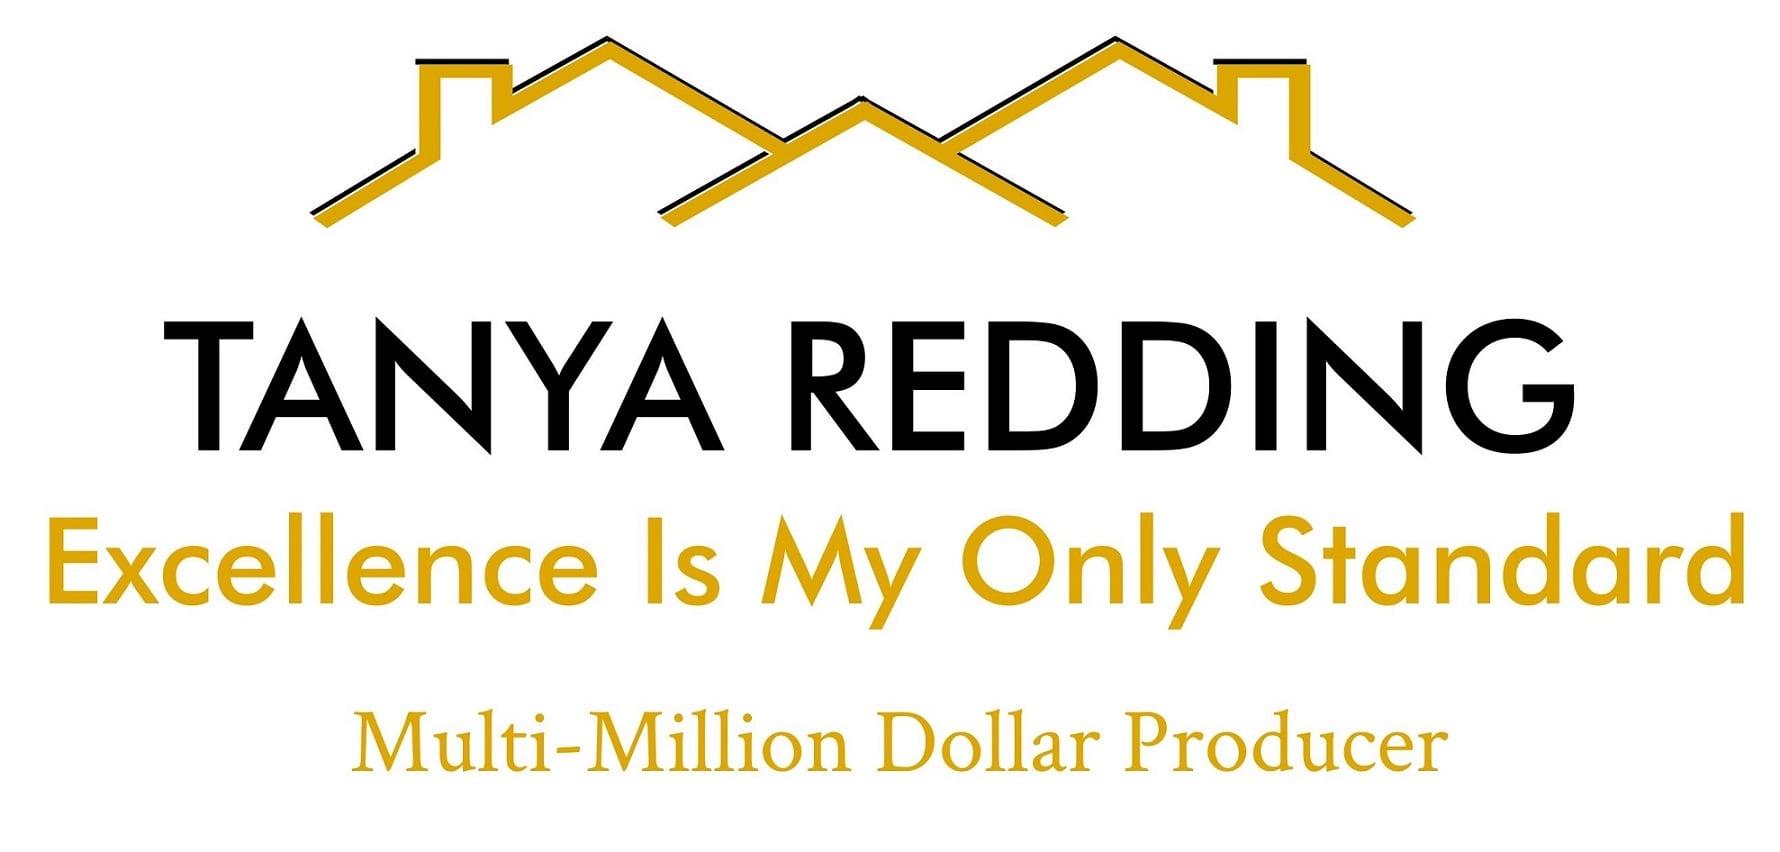 Tanya Redding